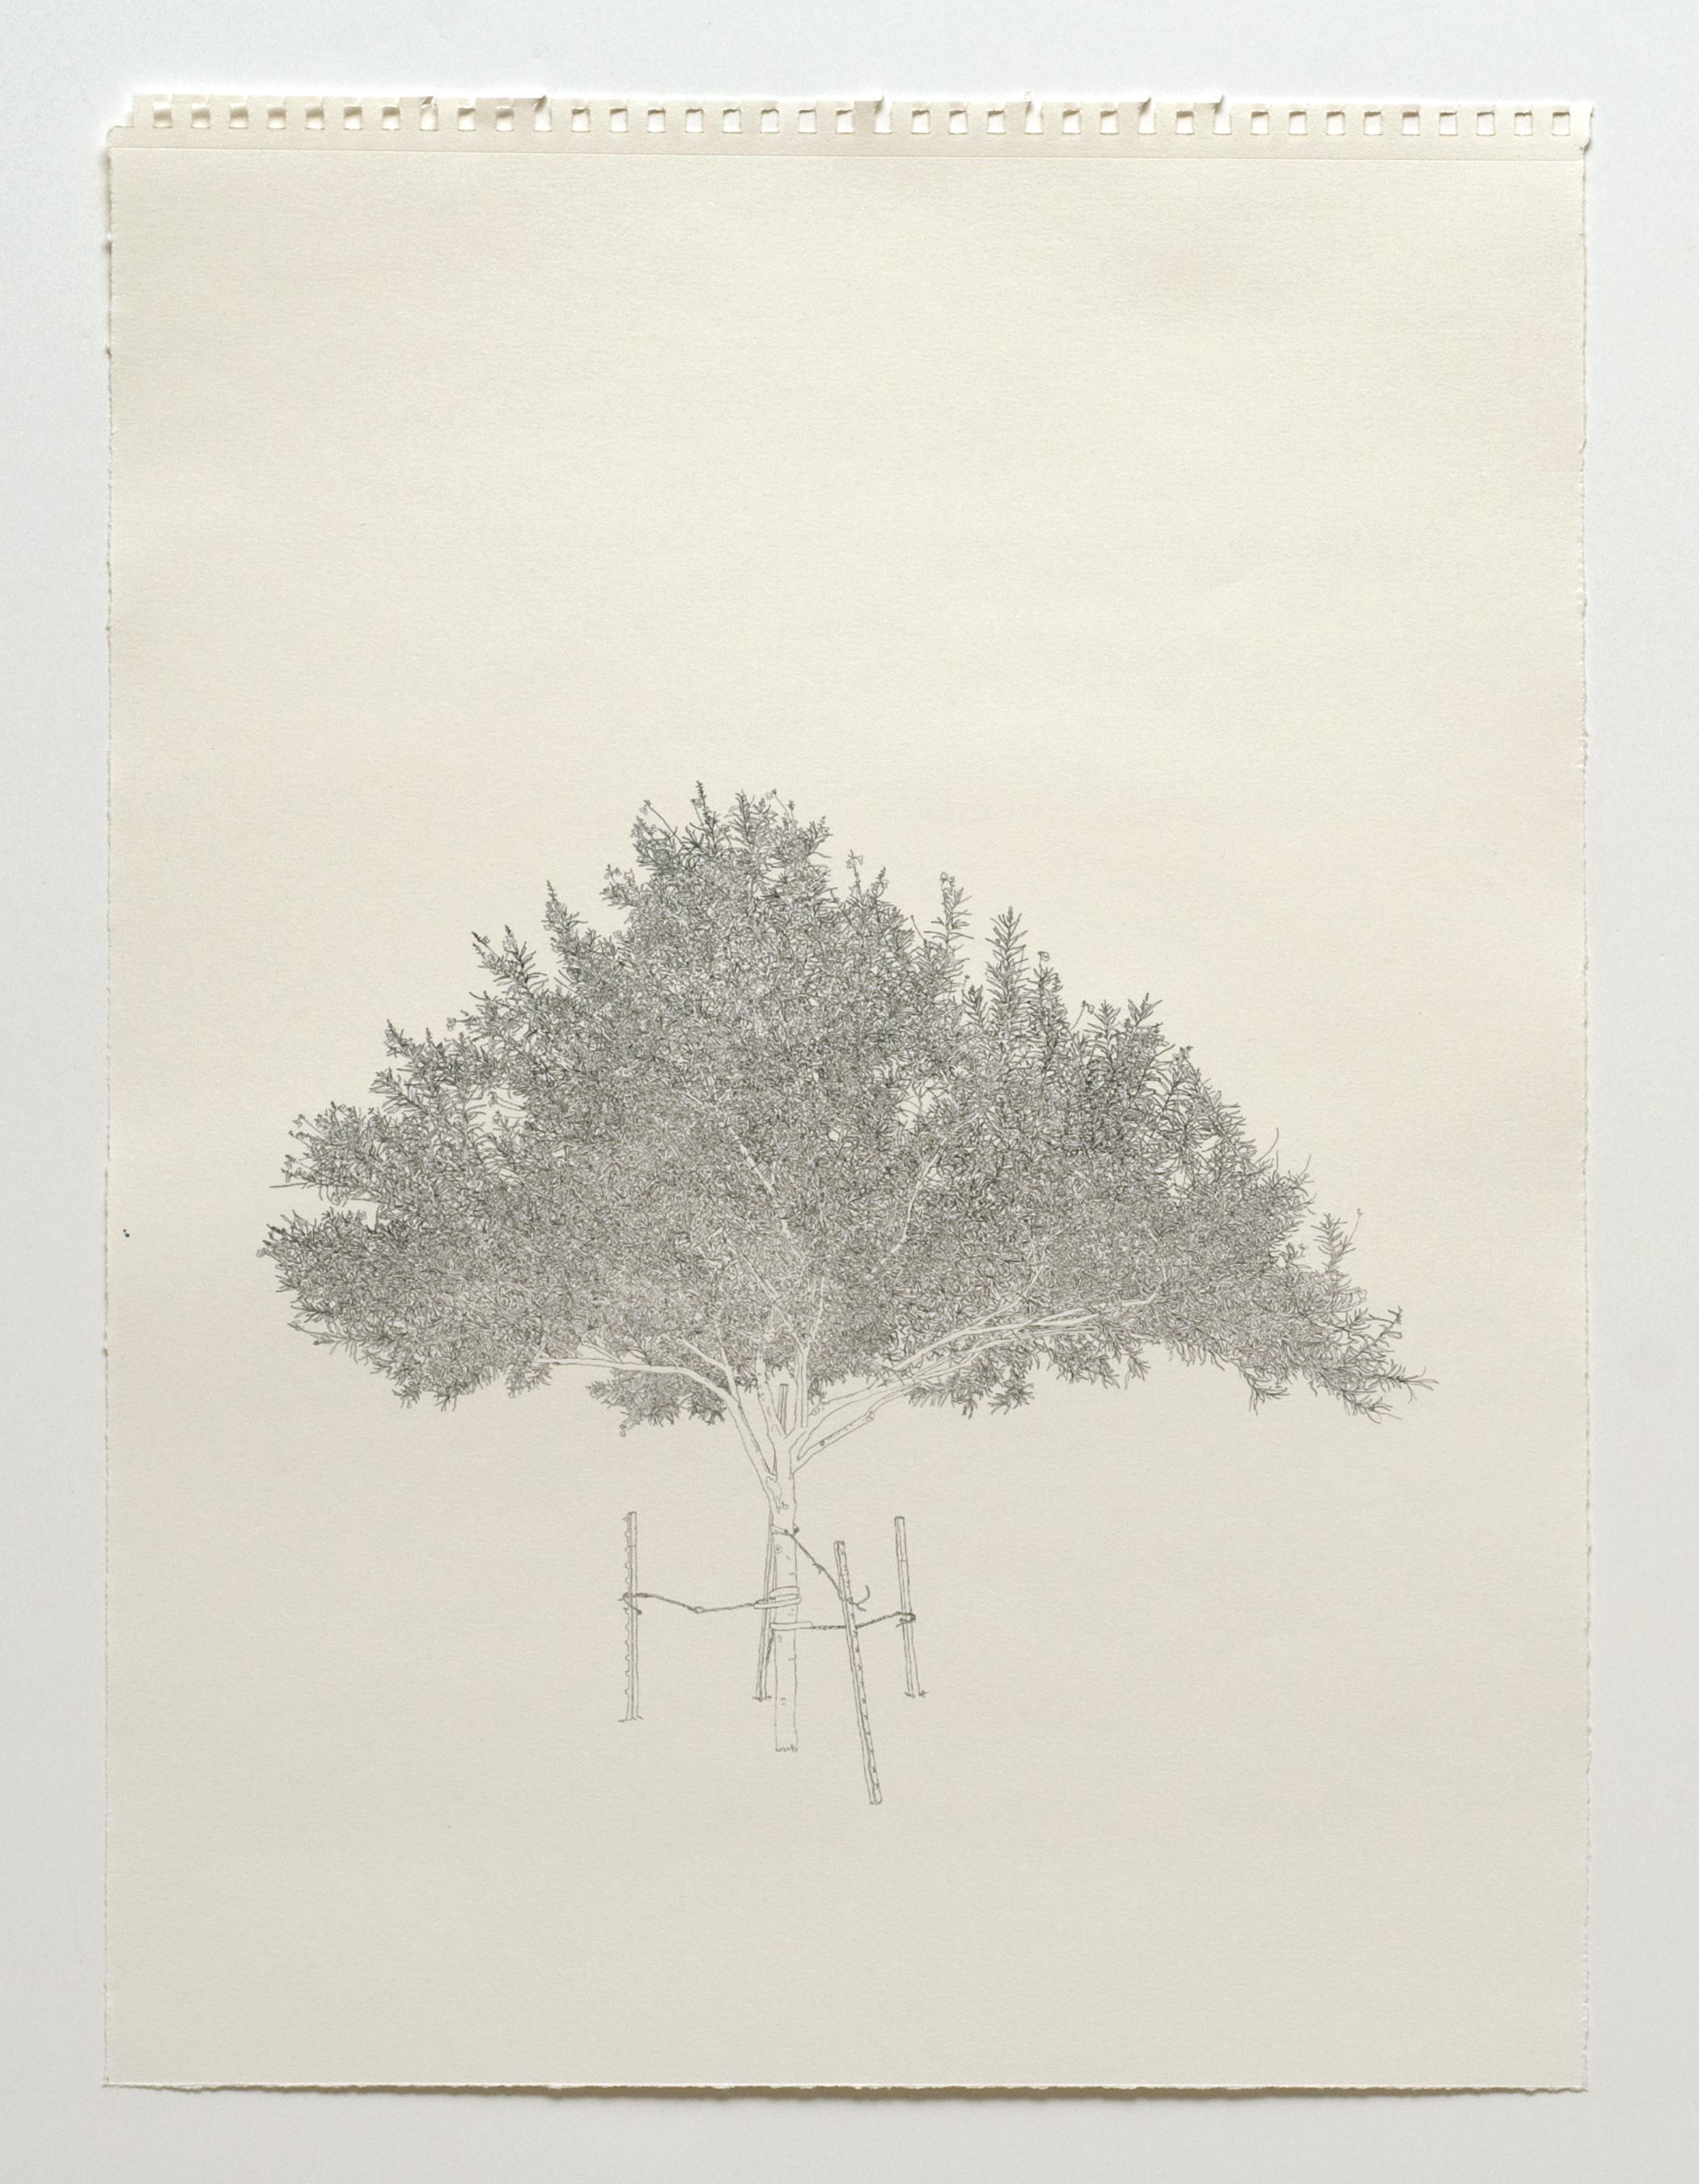 05_trees_02.jpg